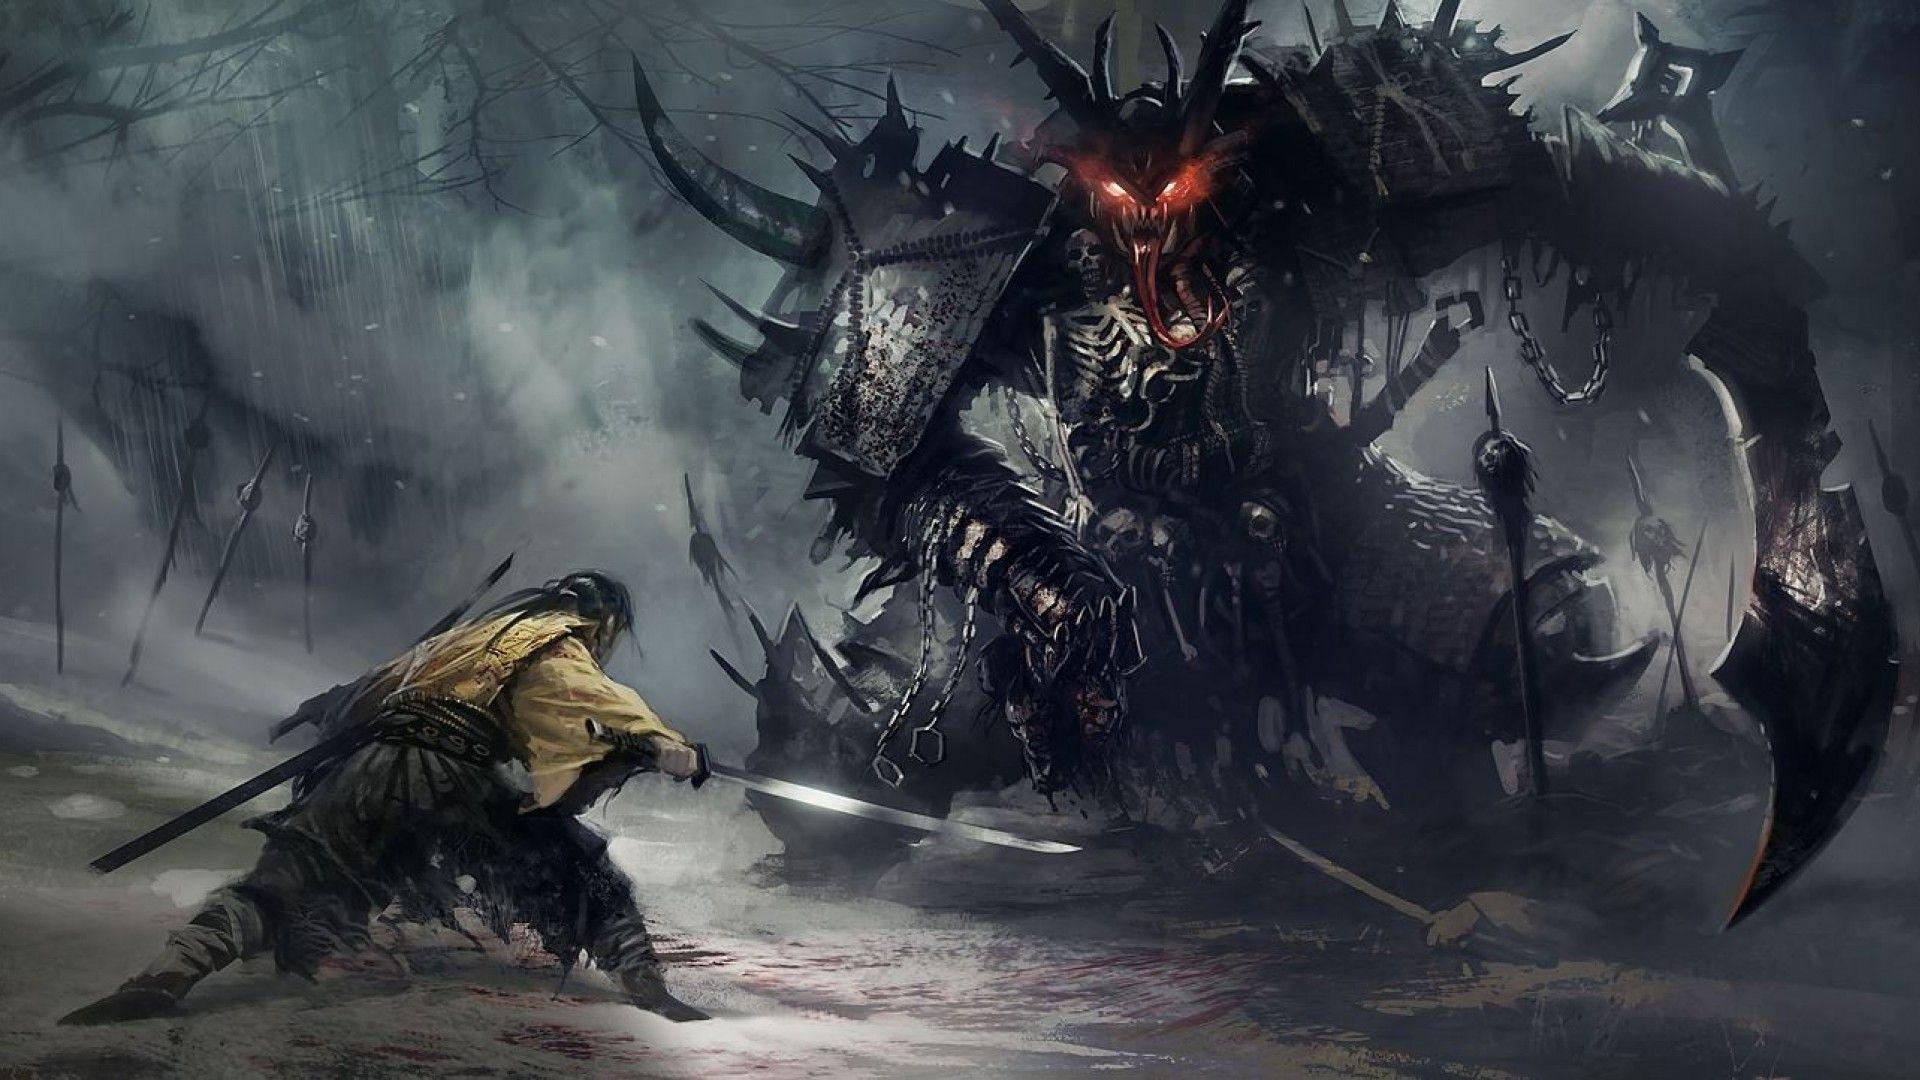 samurai_fantasy_art_red_eyes_artwork_swordsman_1920x1080